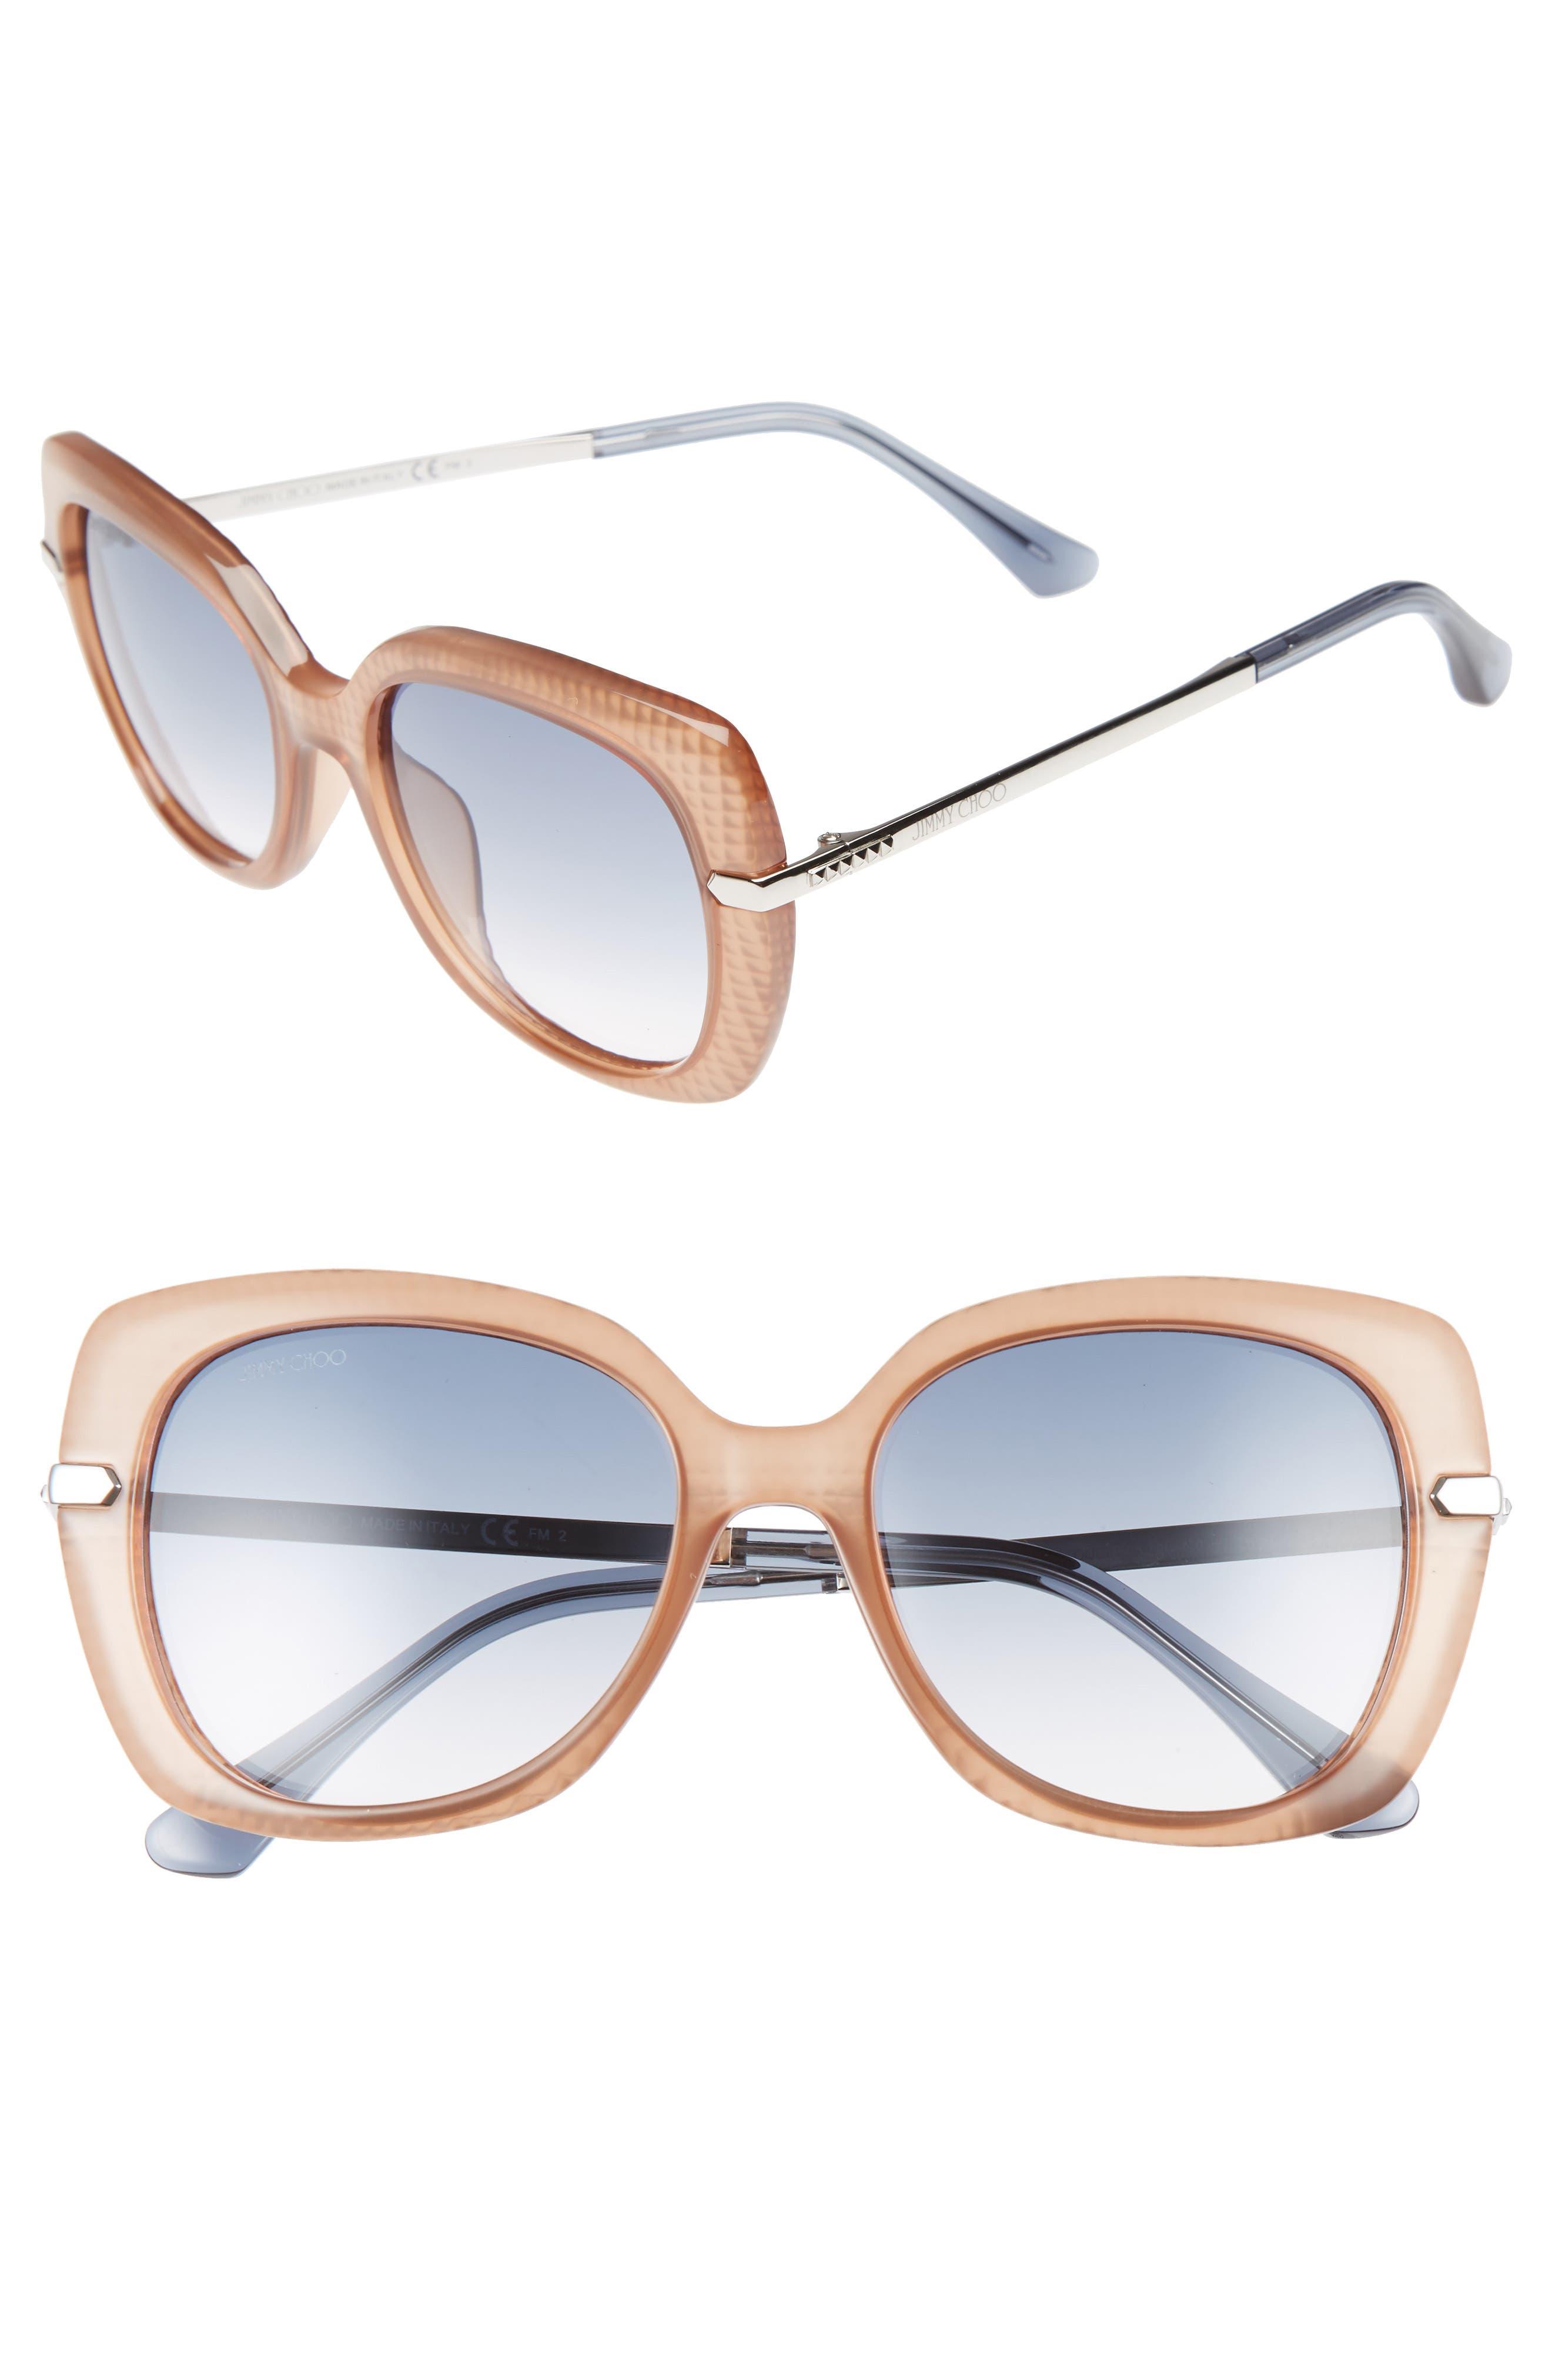 Jimmy Choo Ludis 53mm Gradient Sunglasses